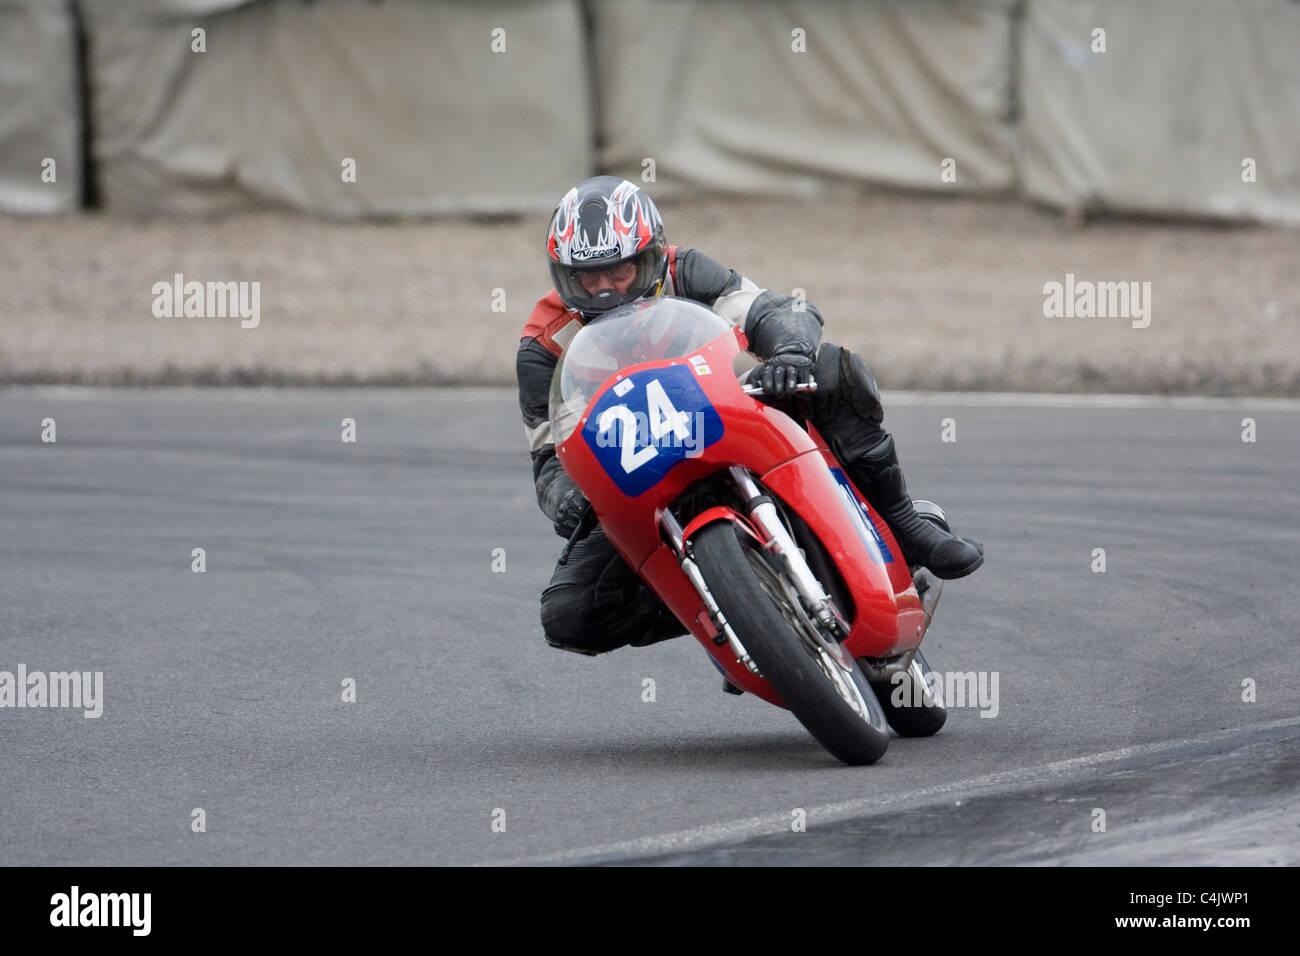 Drixton Honda 348cc ridden by Paul Wood - Stock Image